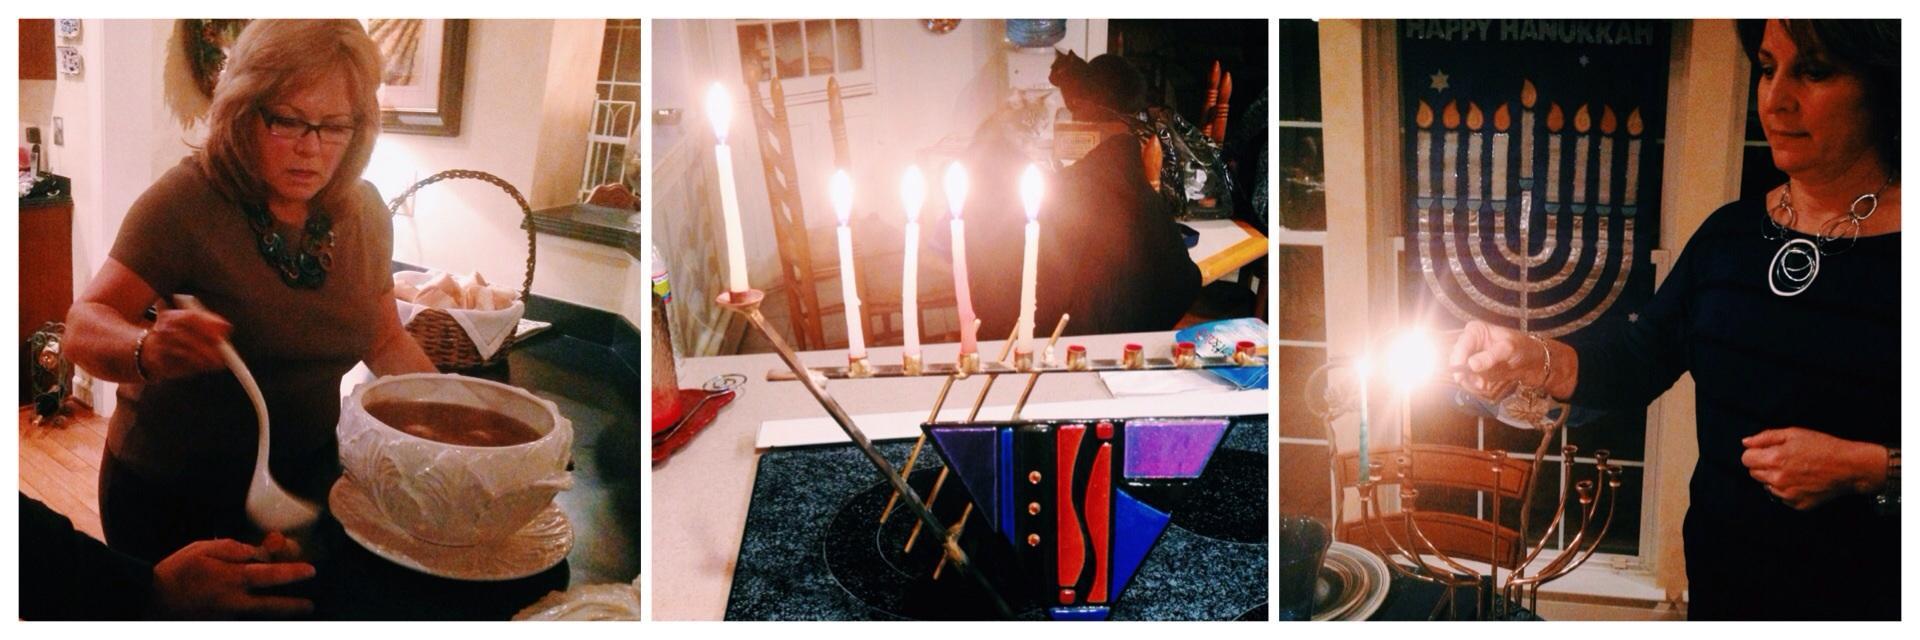 The author's family celebrating Hanukkah.